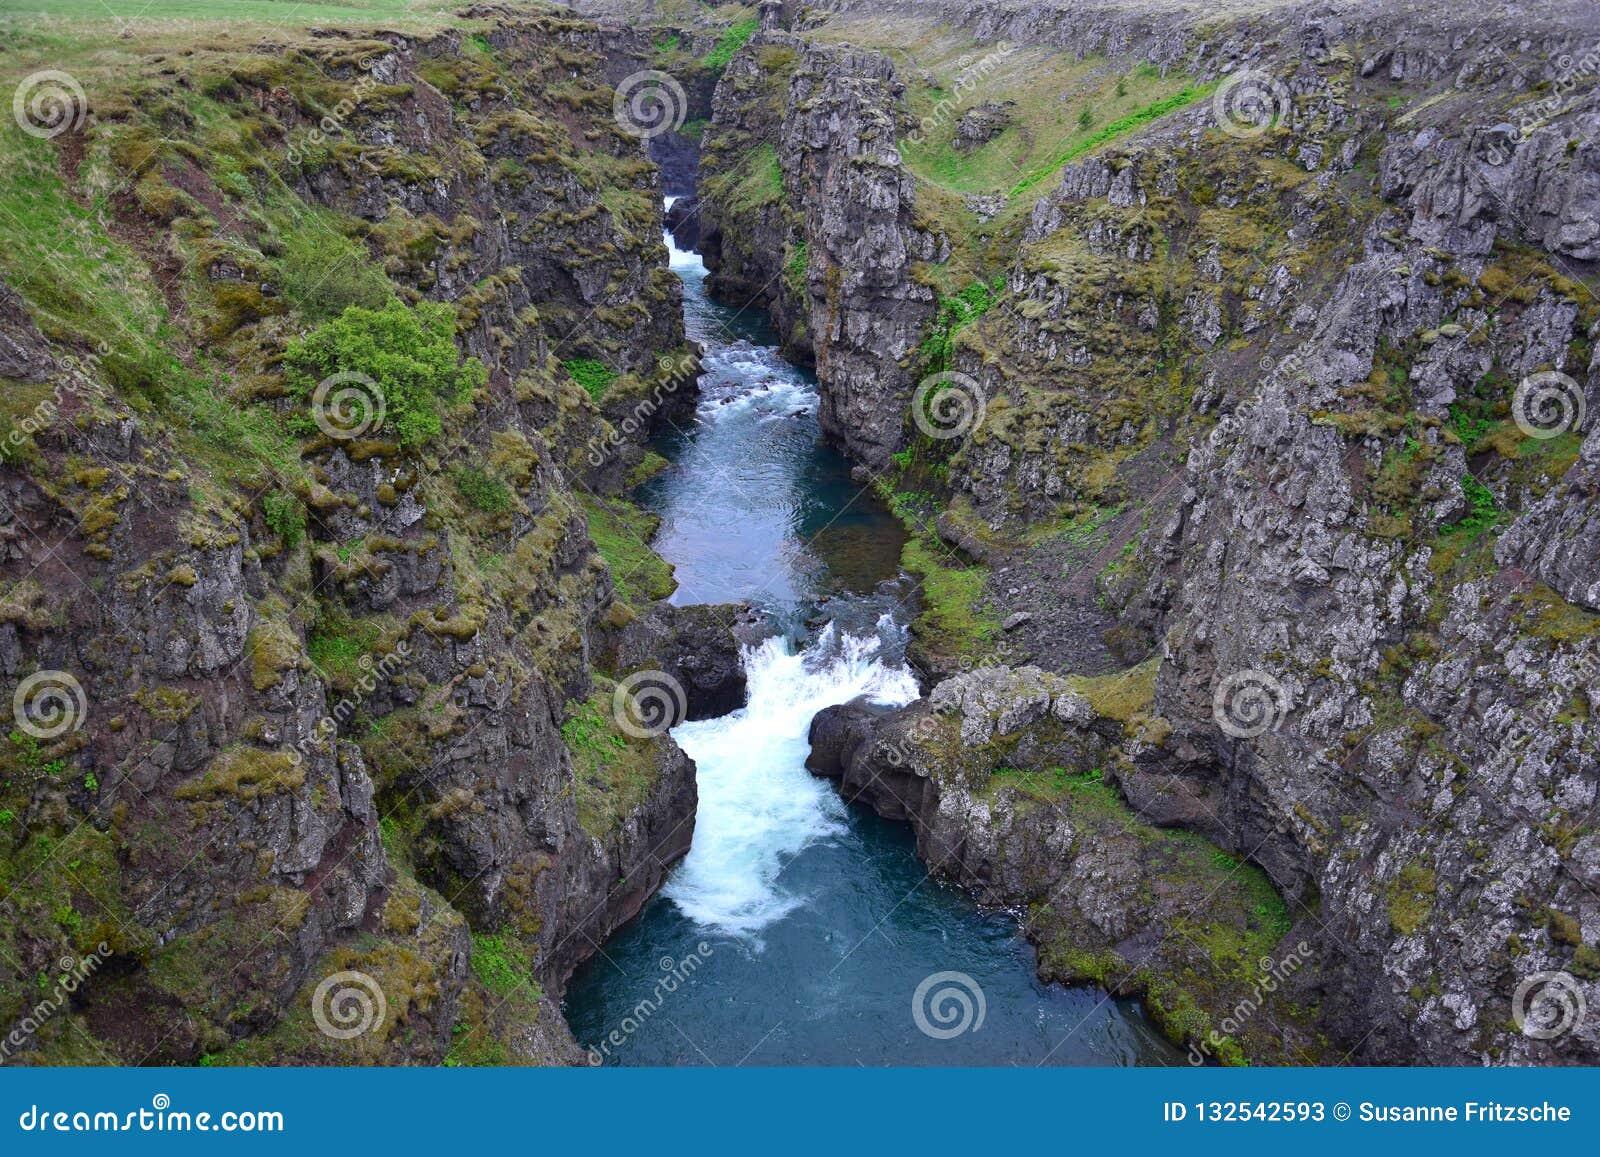 The Kolugljufur canyon in Iceland